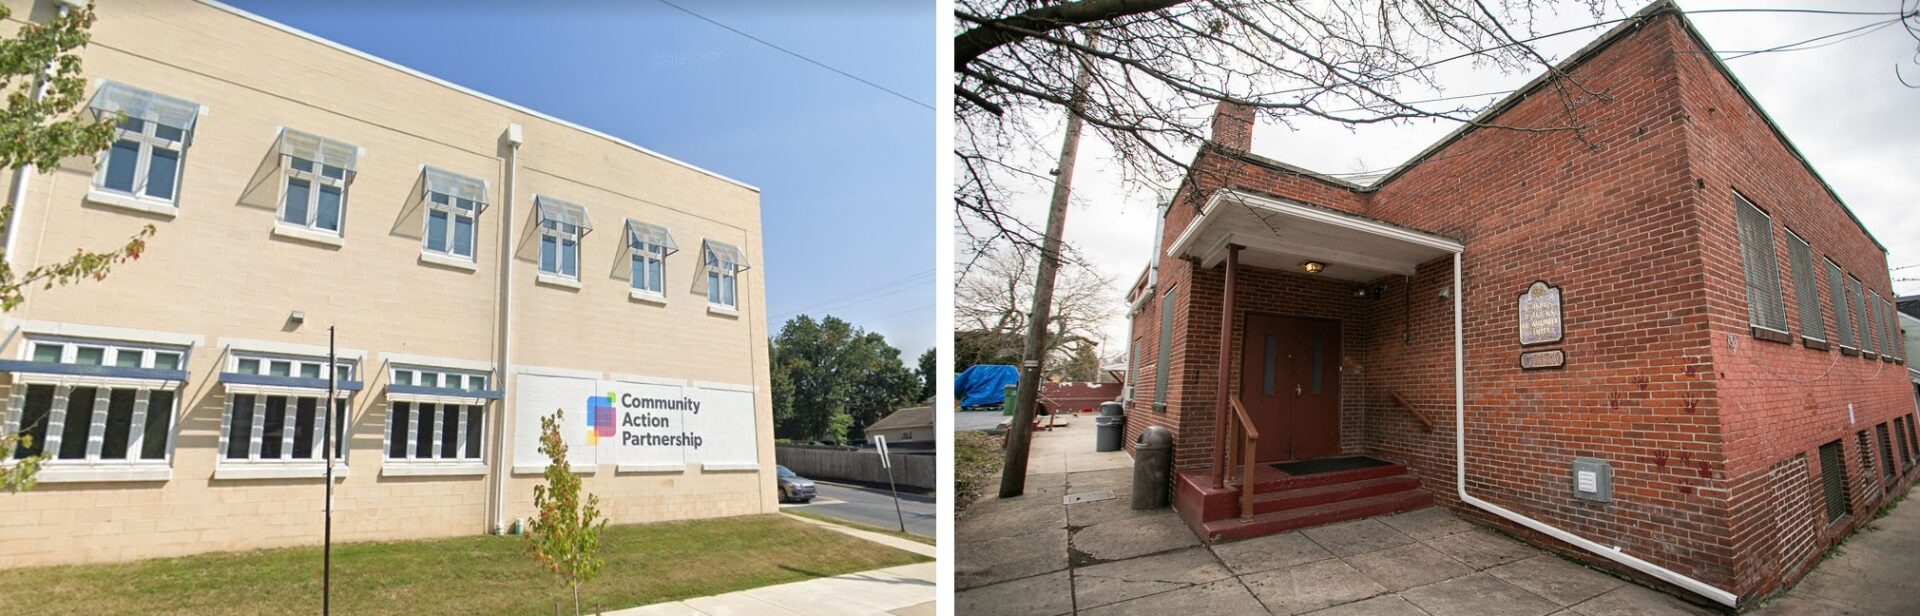 Left: Community Action Partnership of Lancaster County.  (Source: Google Street View) Right: Crispus Attucks Community Center. (Source: PhotOle Photography)